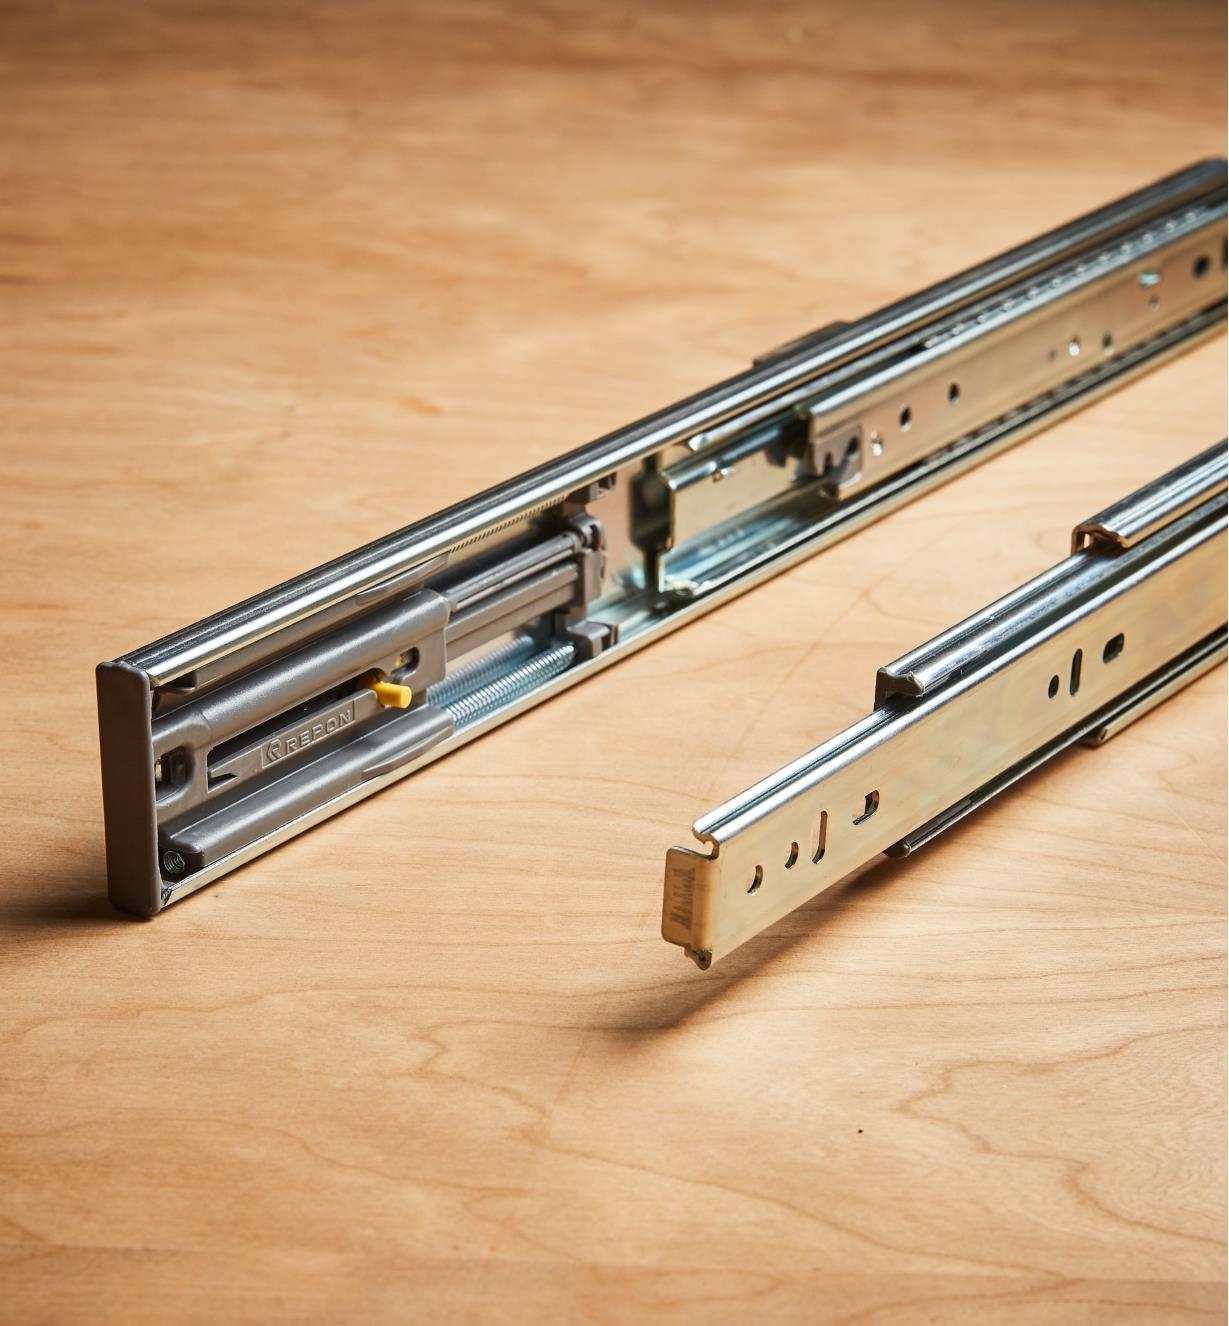 "02K4945 - Zinc Plate, 450mm (18""), Soft-Closing Full-Extension Slides, pr. (100 lb)"